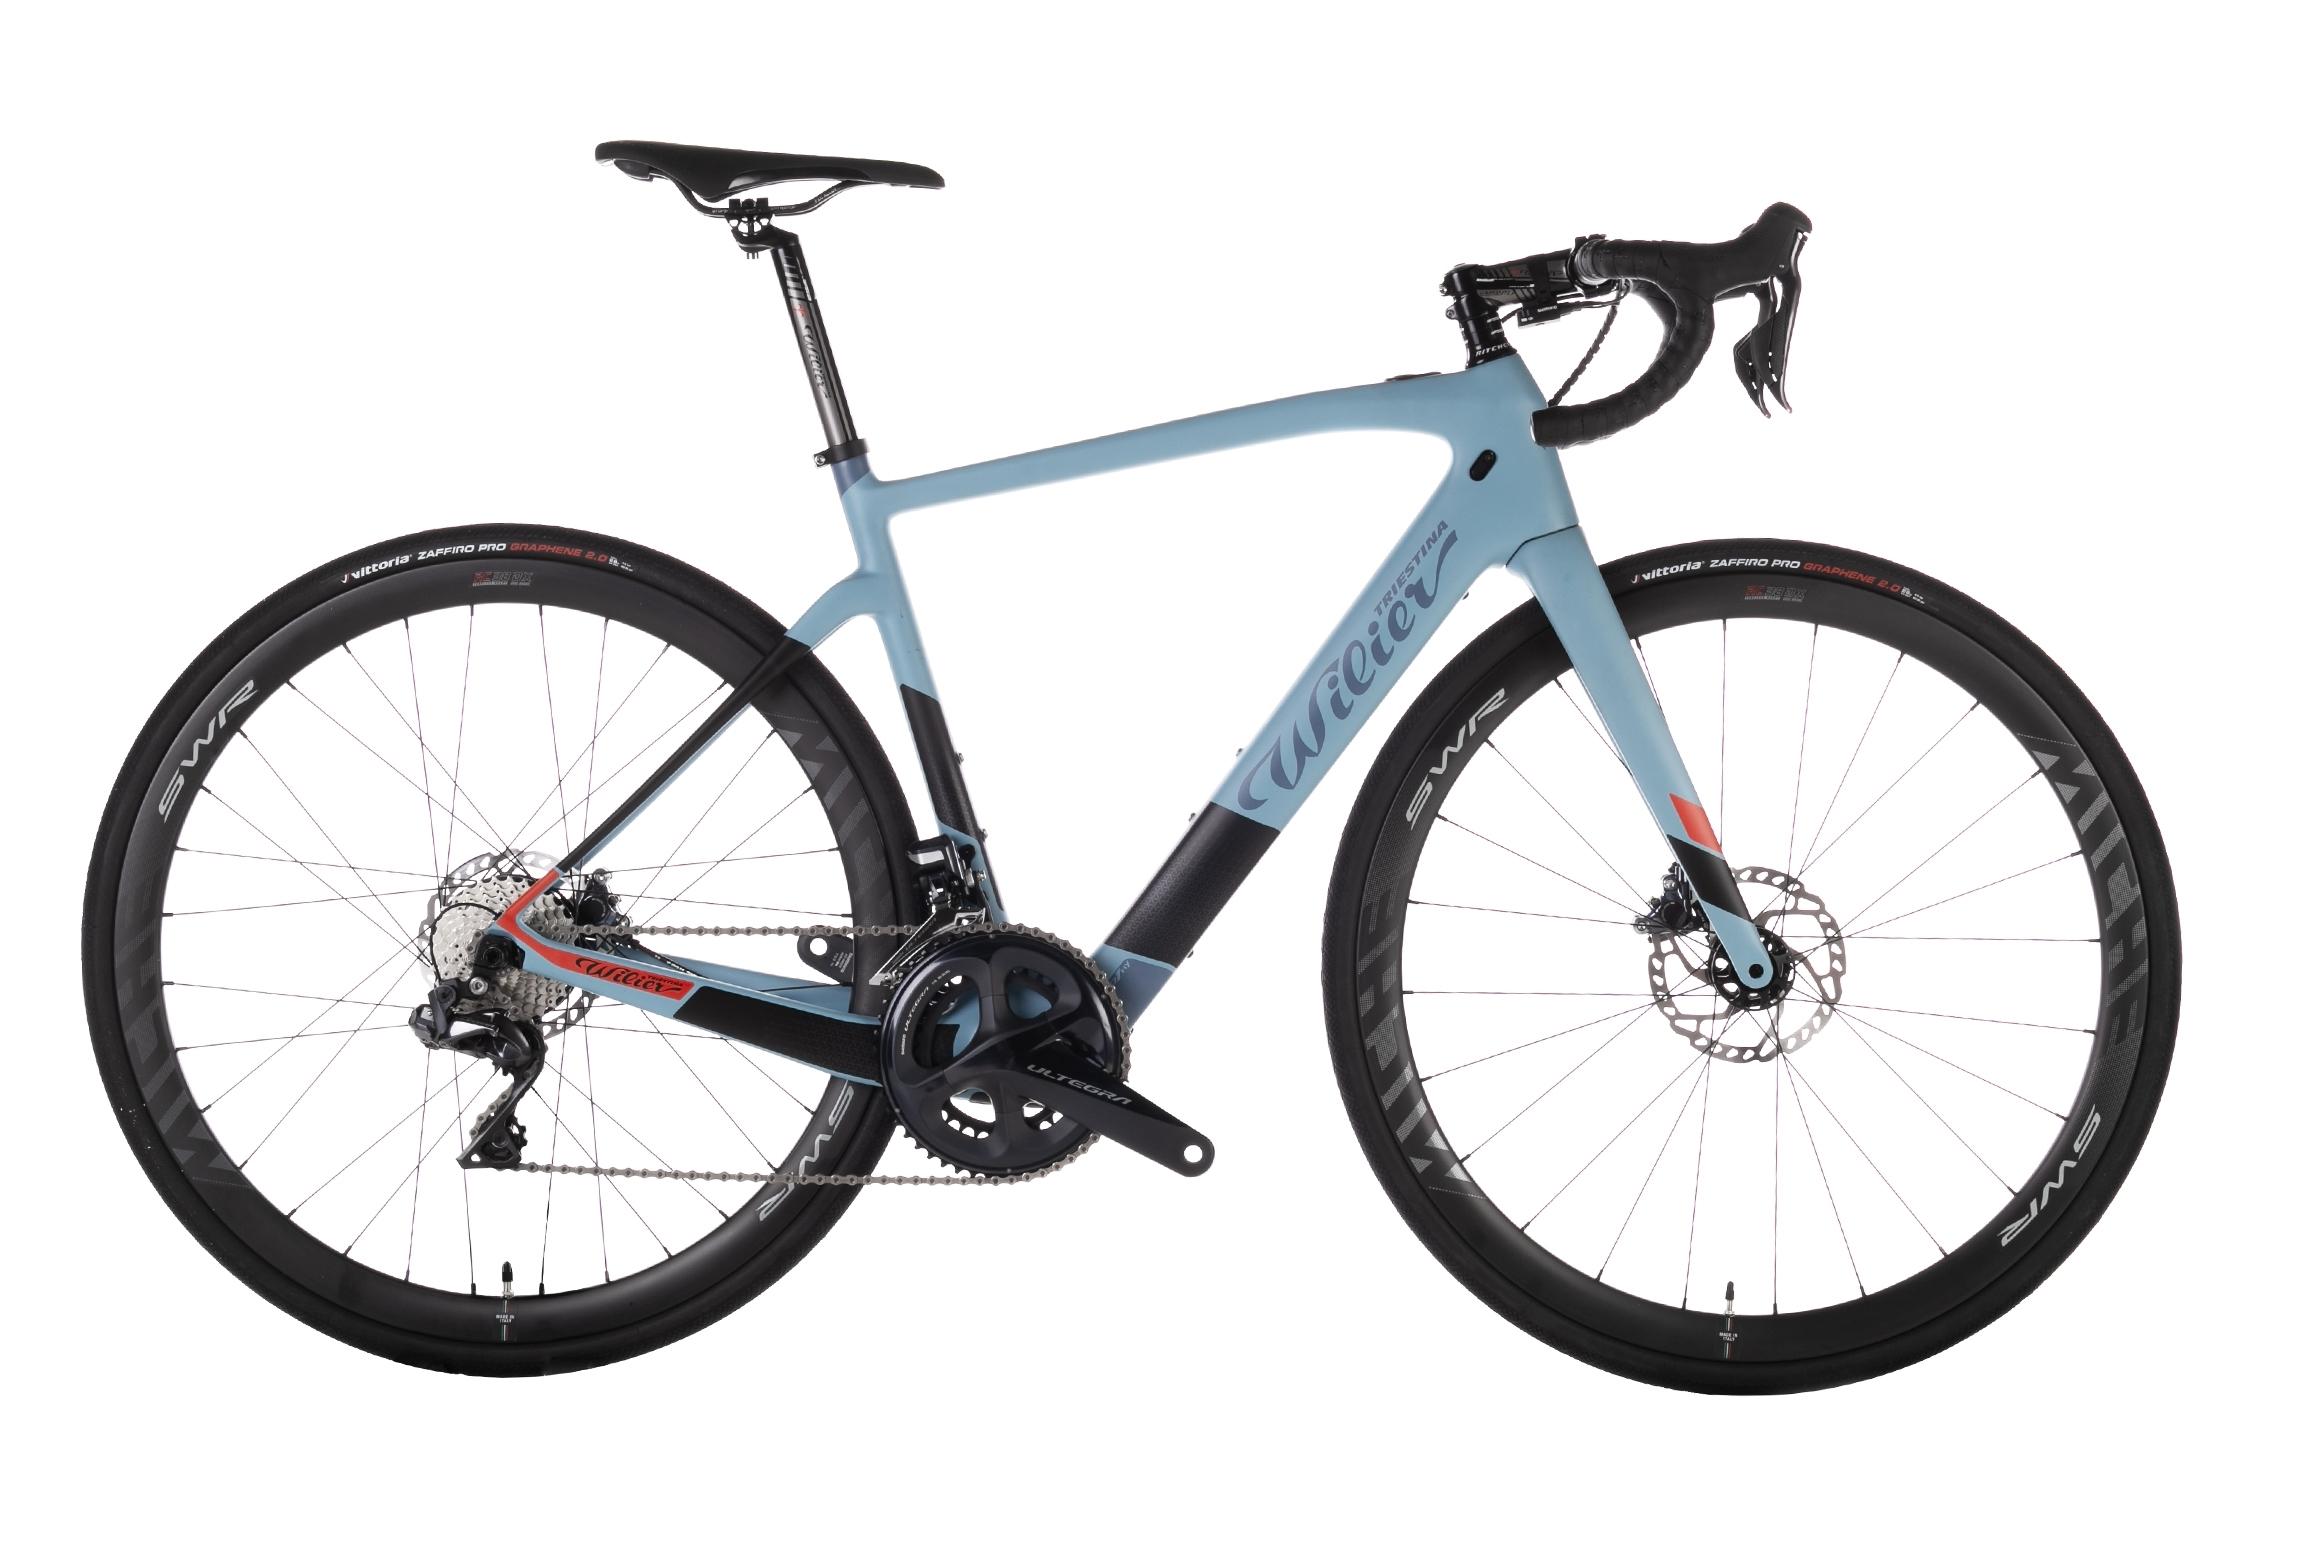 kolo CENTO1HY+ULTEGRA Di2 8070+REVOX blue black XL